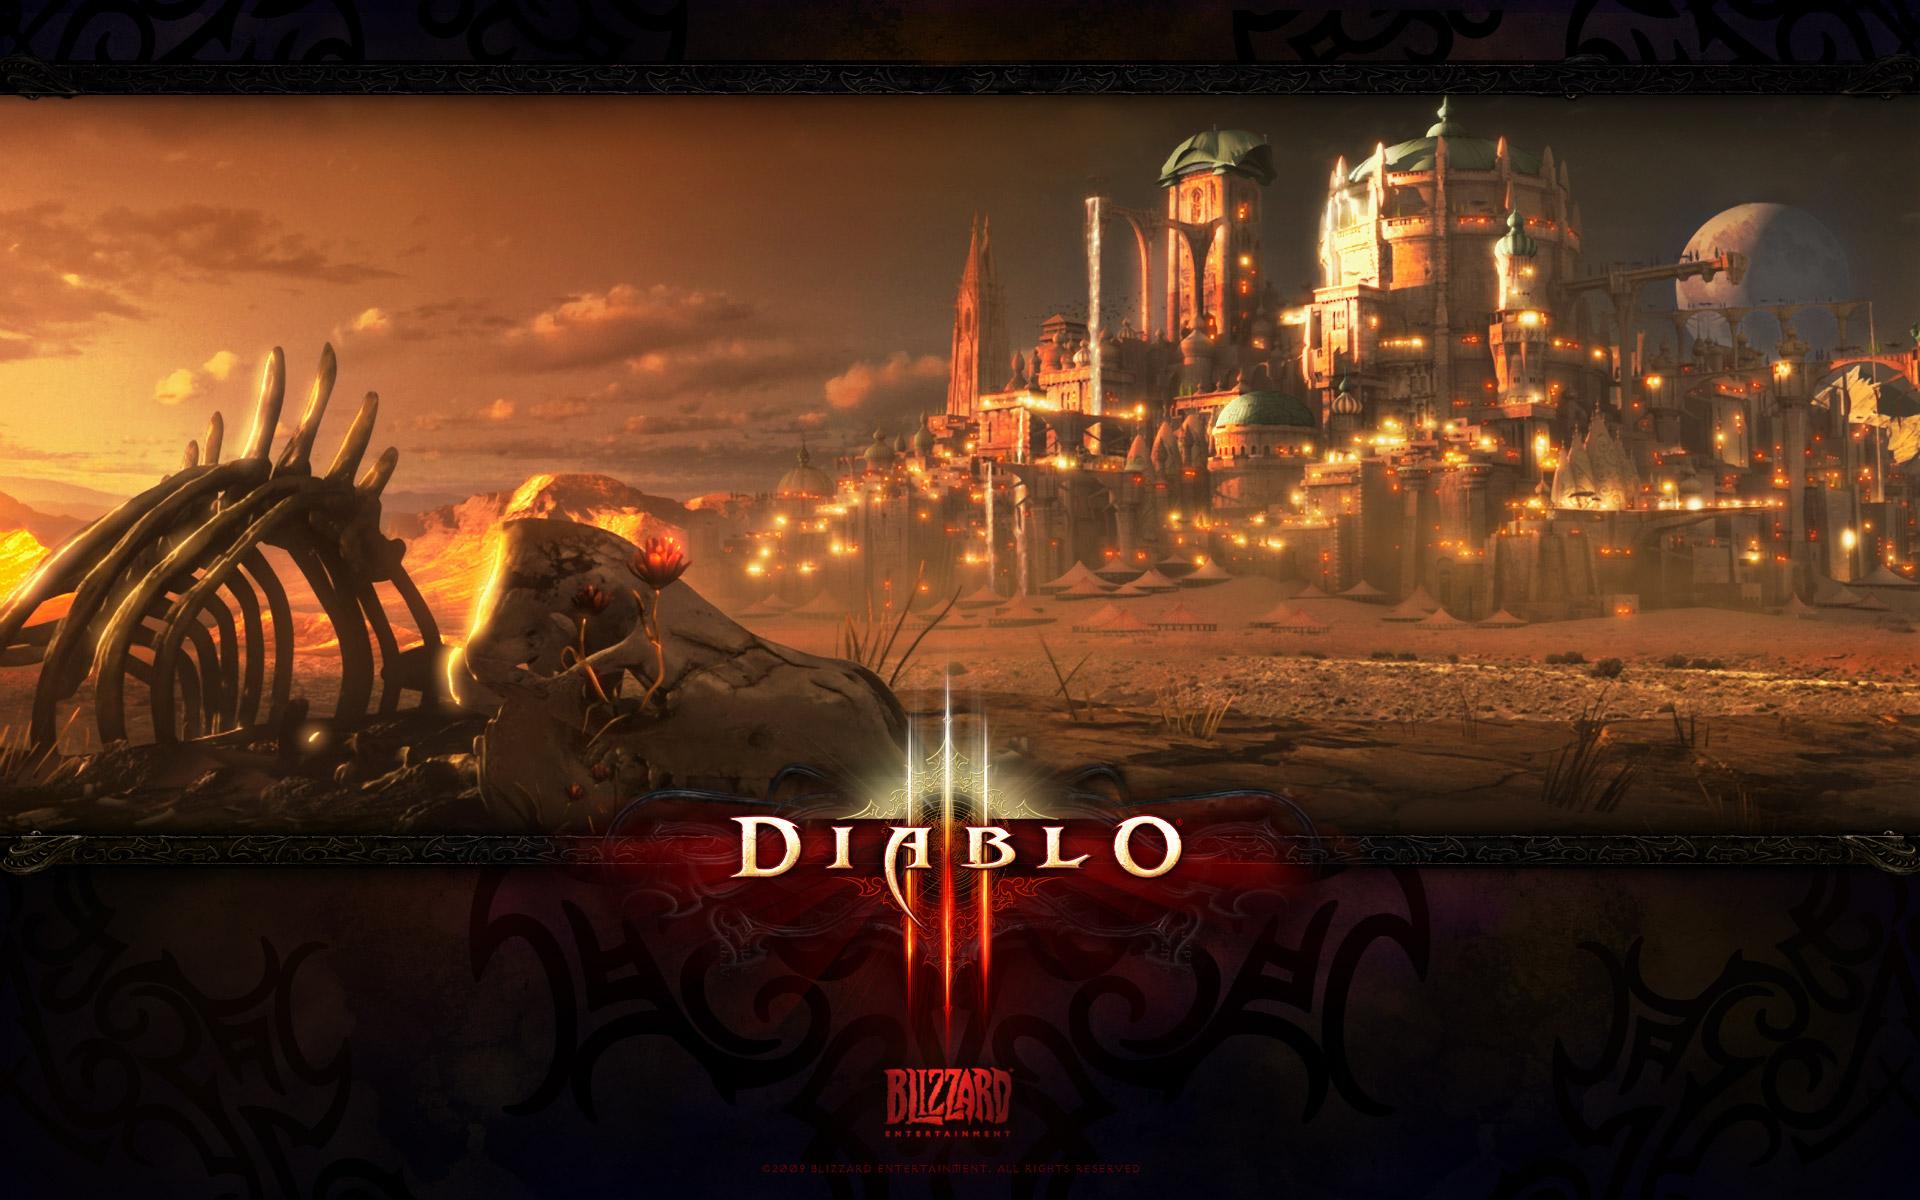 Diablo 3 wallpaper 2